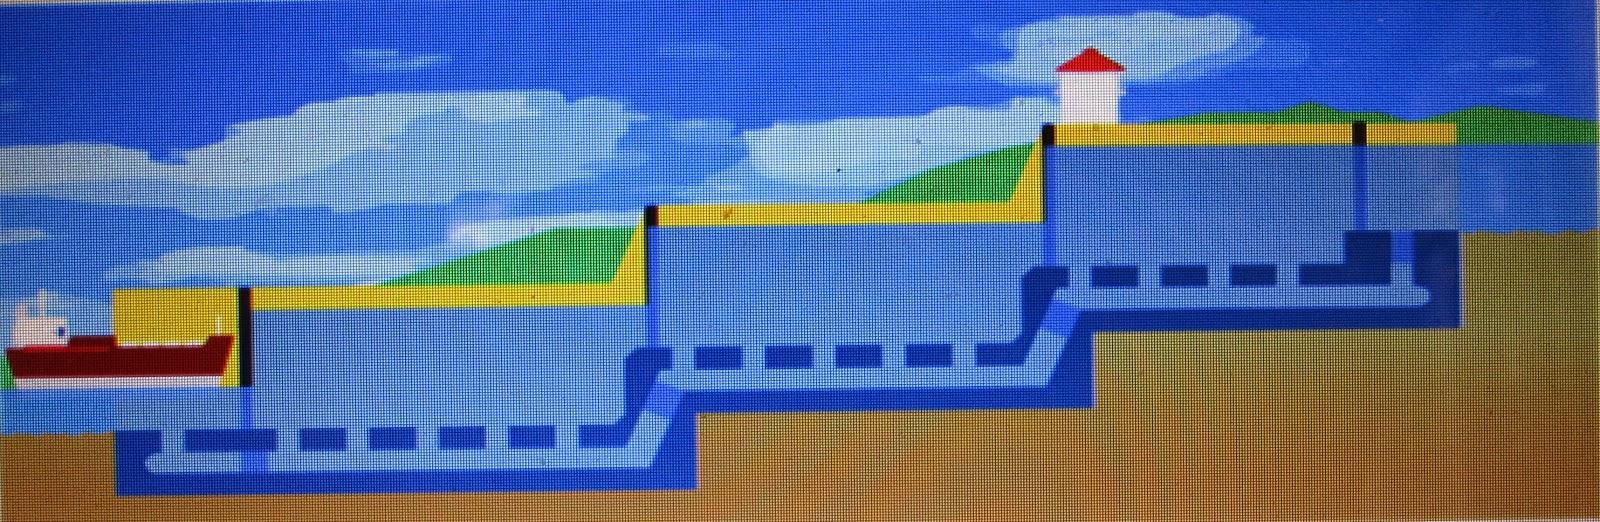 Figure showing a set of Locks - Panama Canal